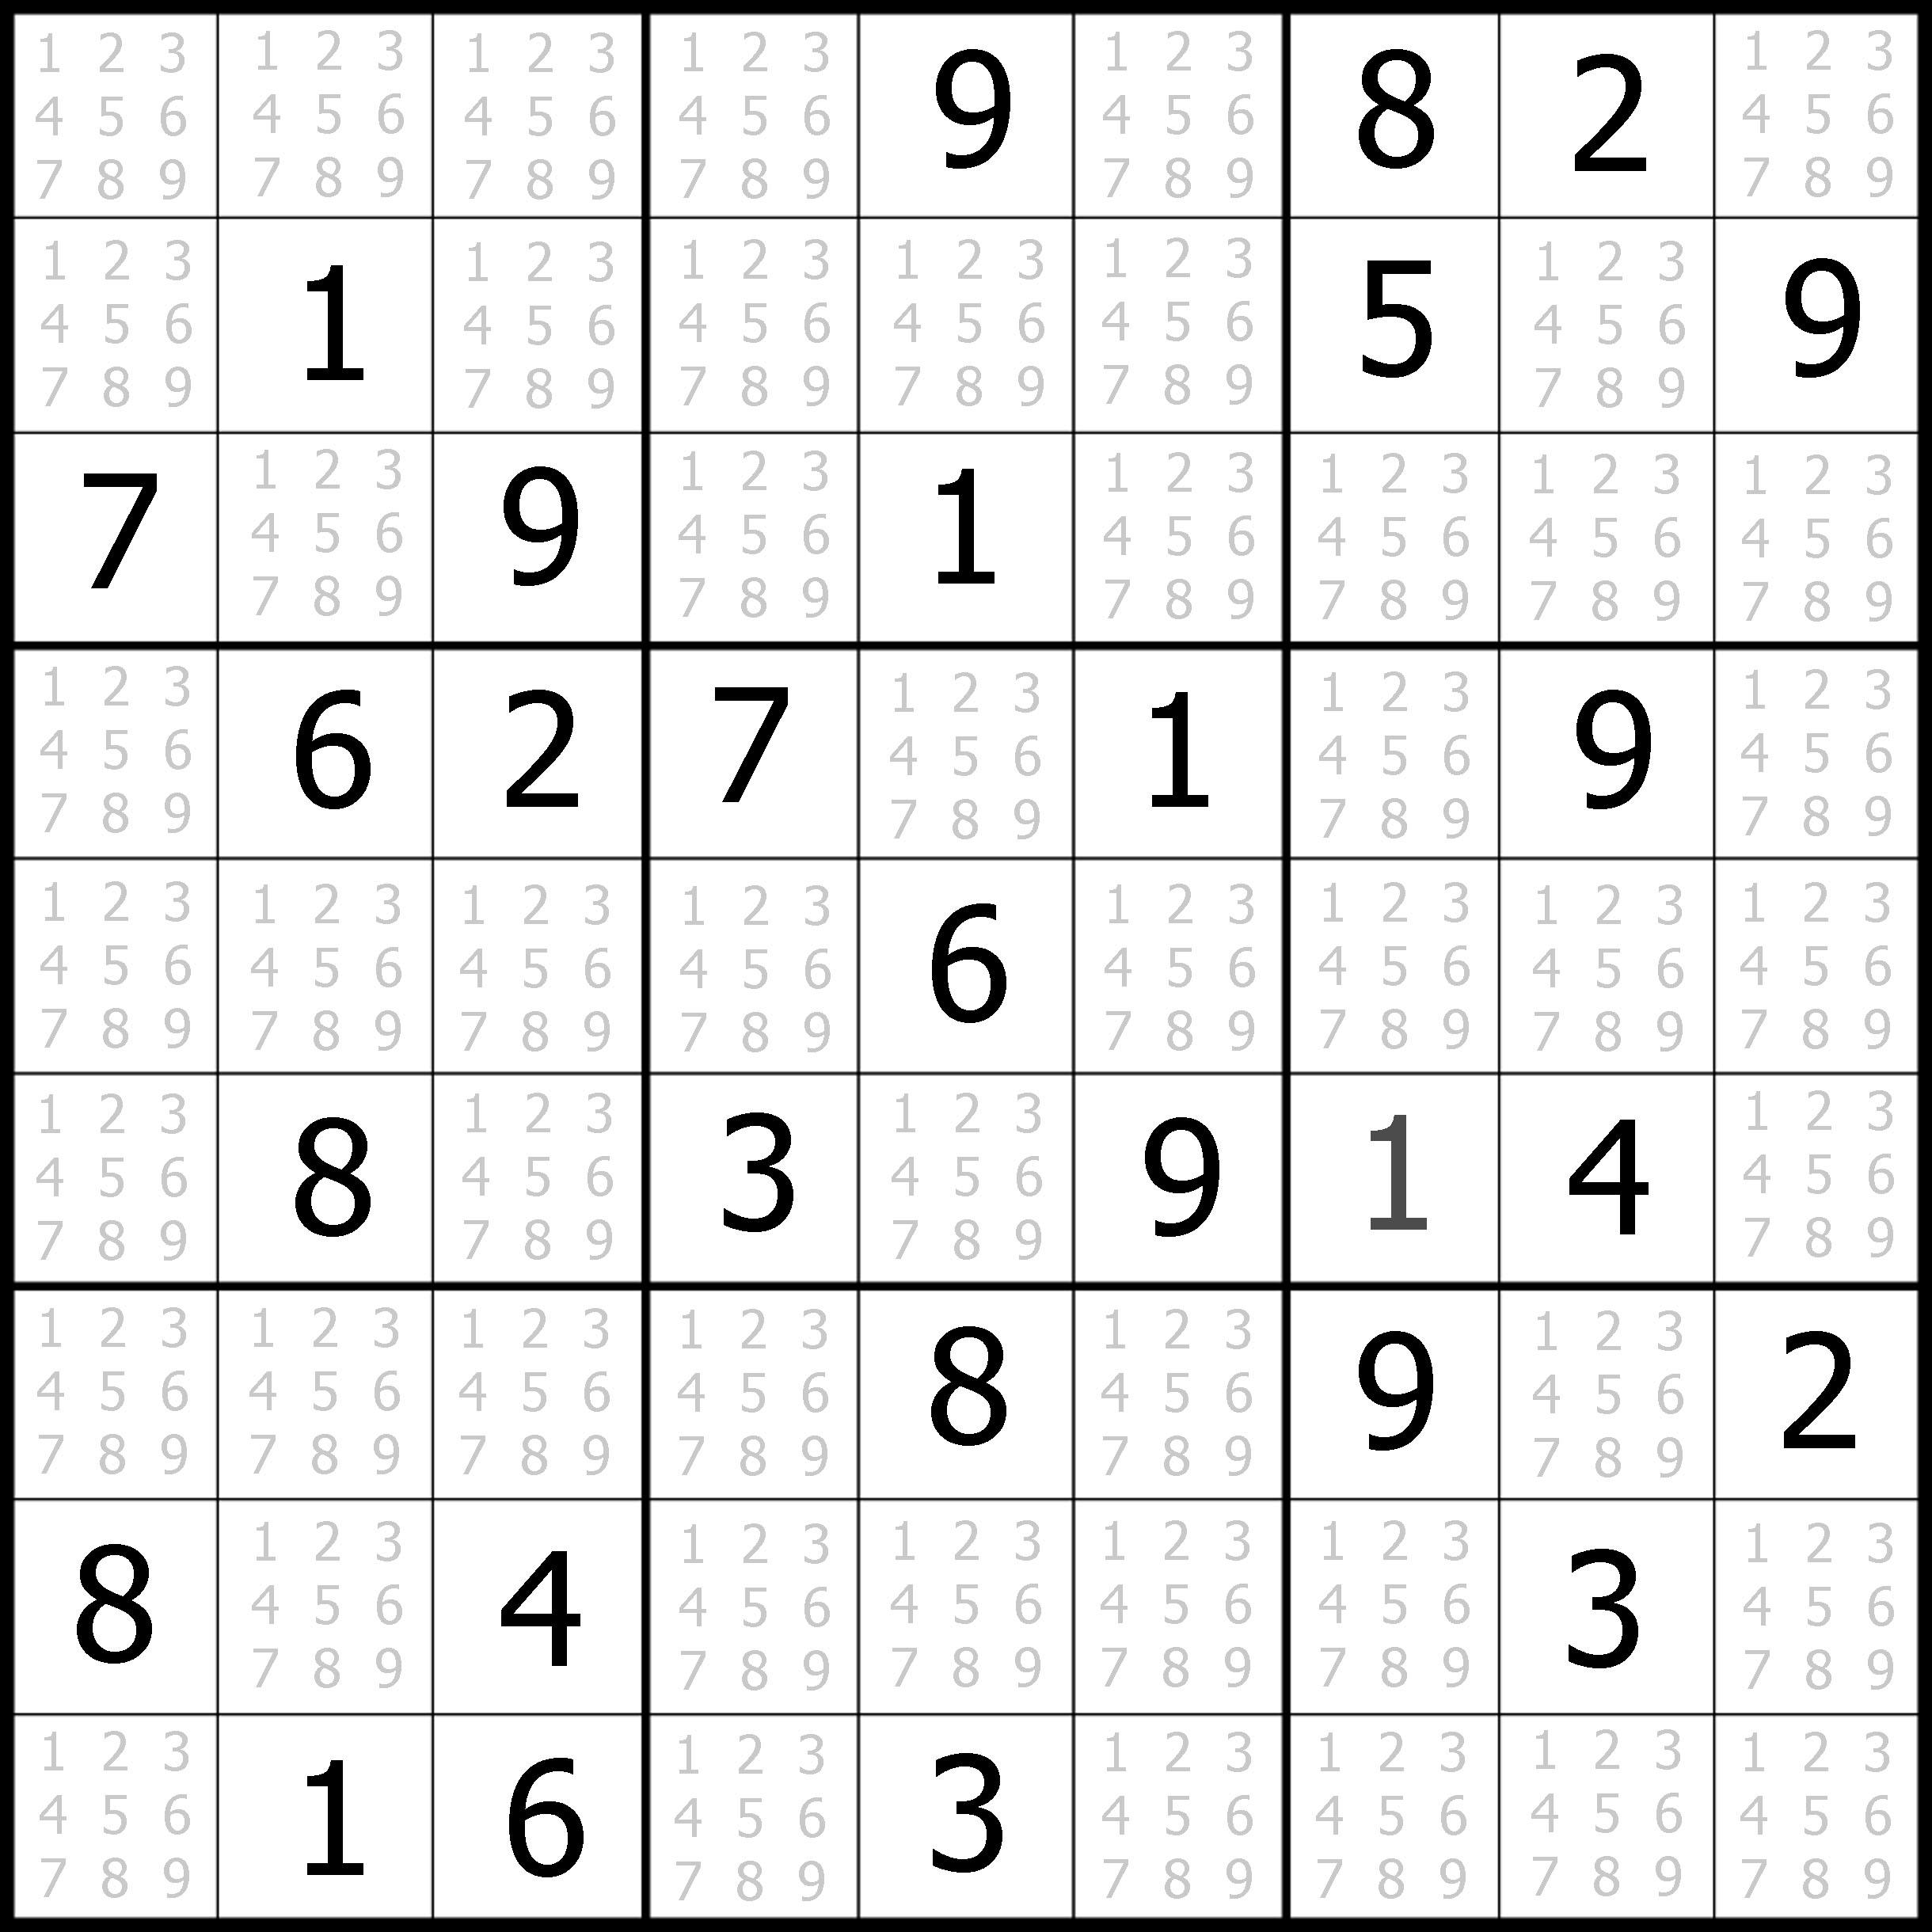 Sudoku Puzzler | Free, Printable, Updated Sudoku Puzzles With A - Printable Sudoku Puzzle Medium